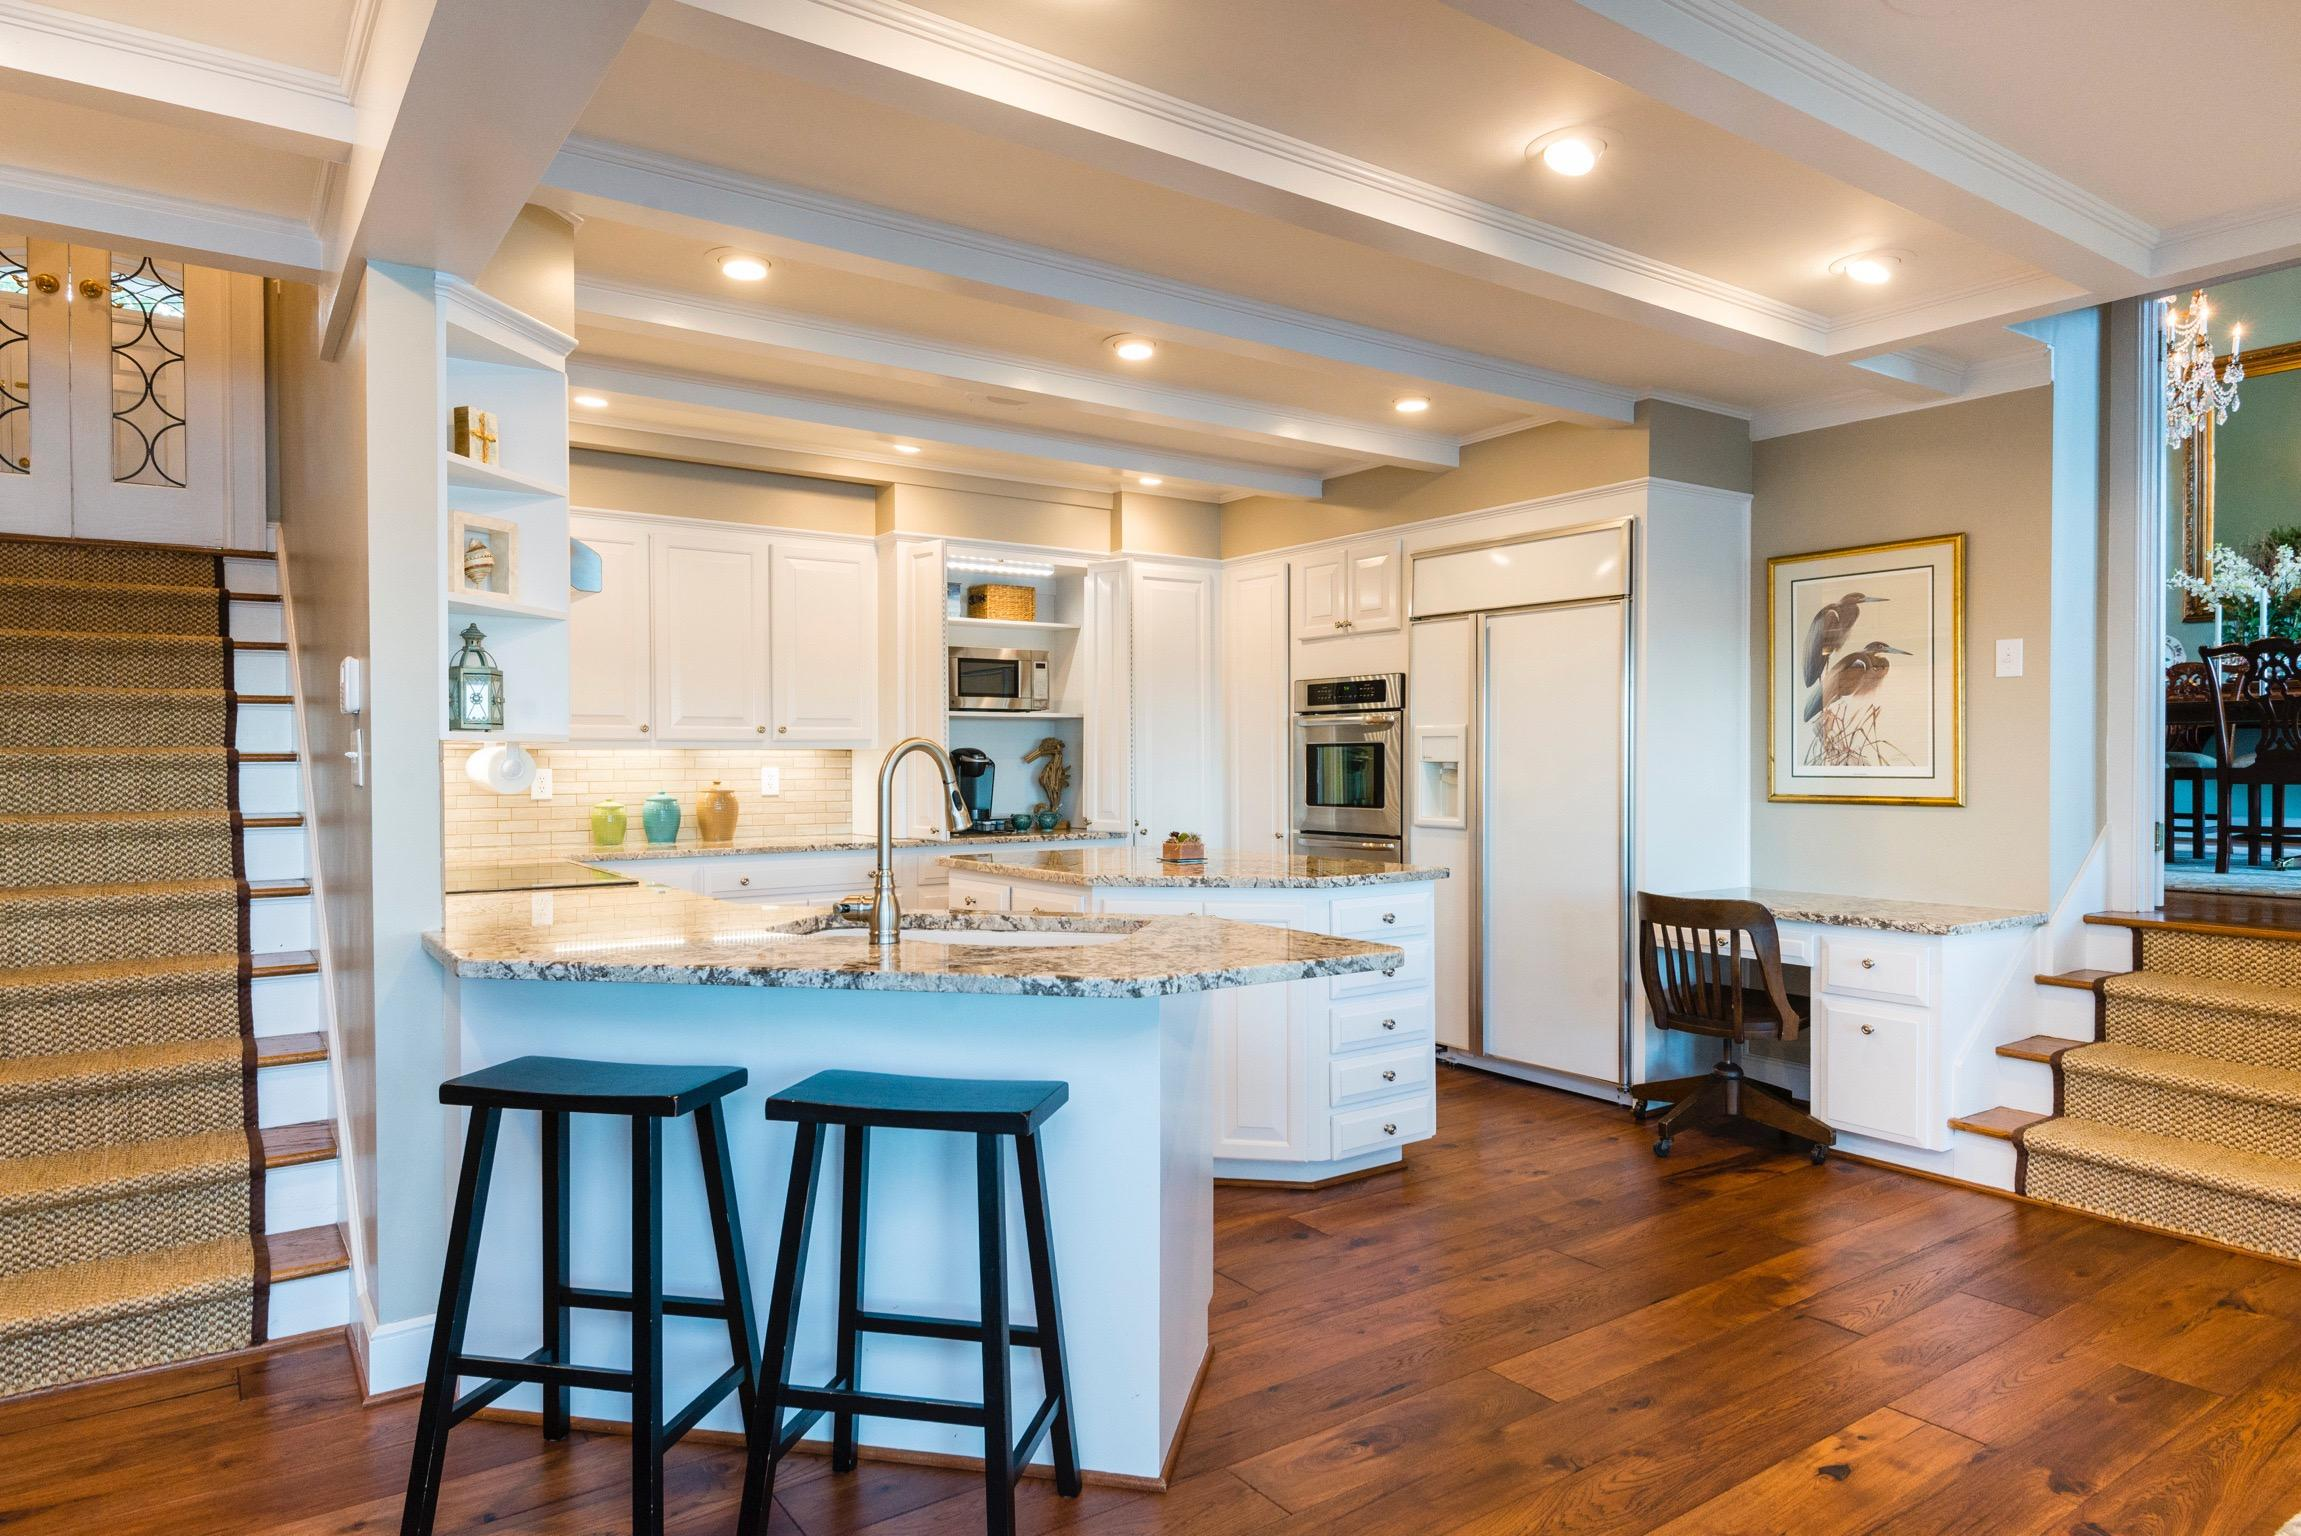 Lawton Bluff Homes For Sale - 685 Shore, Charleston, SC - 26